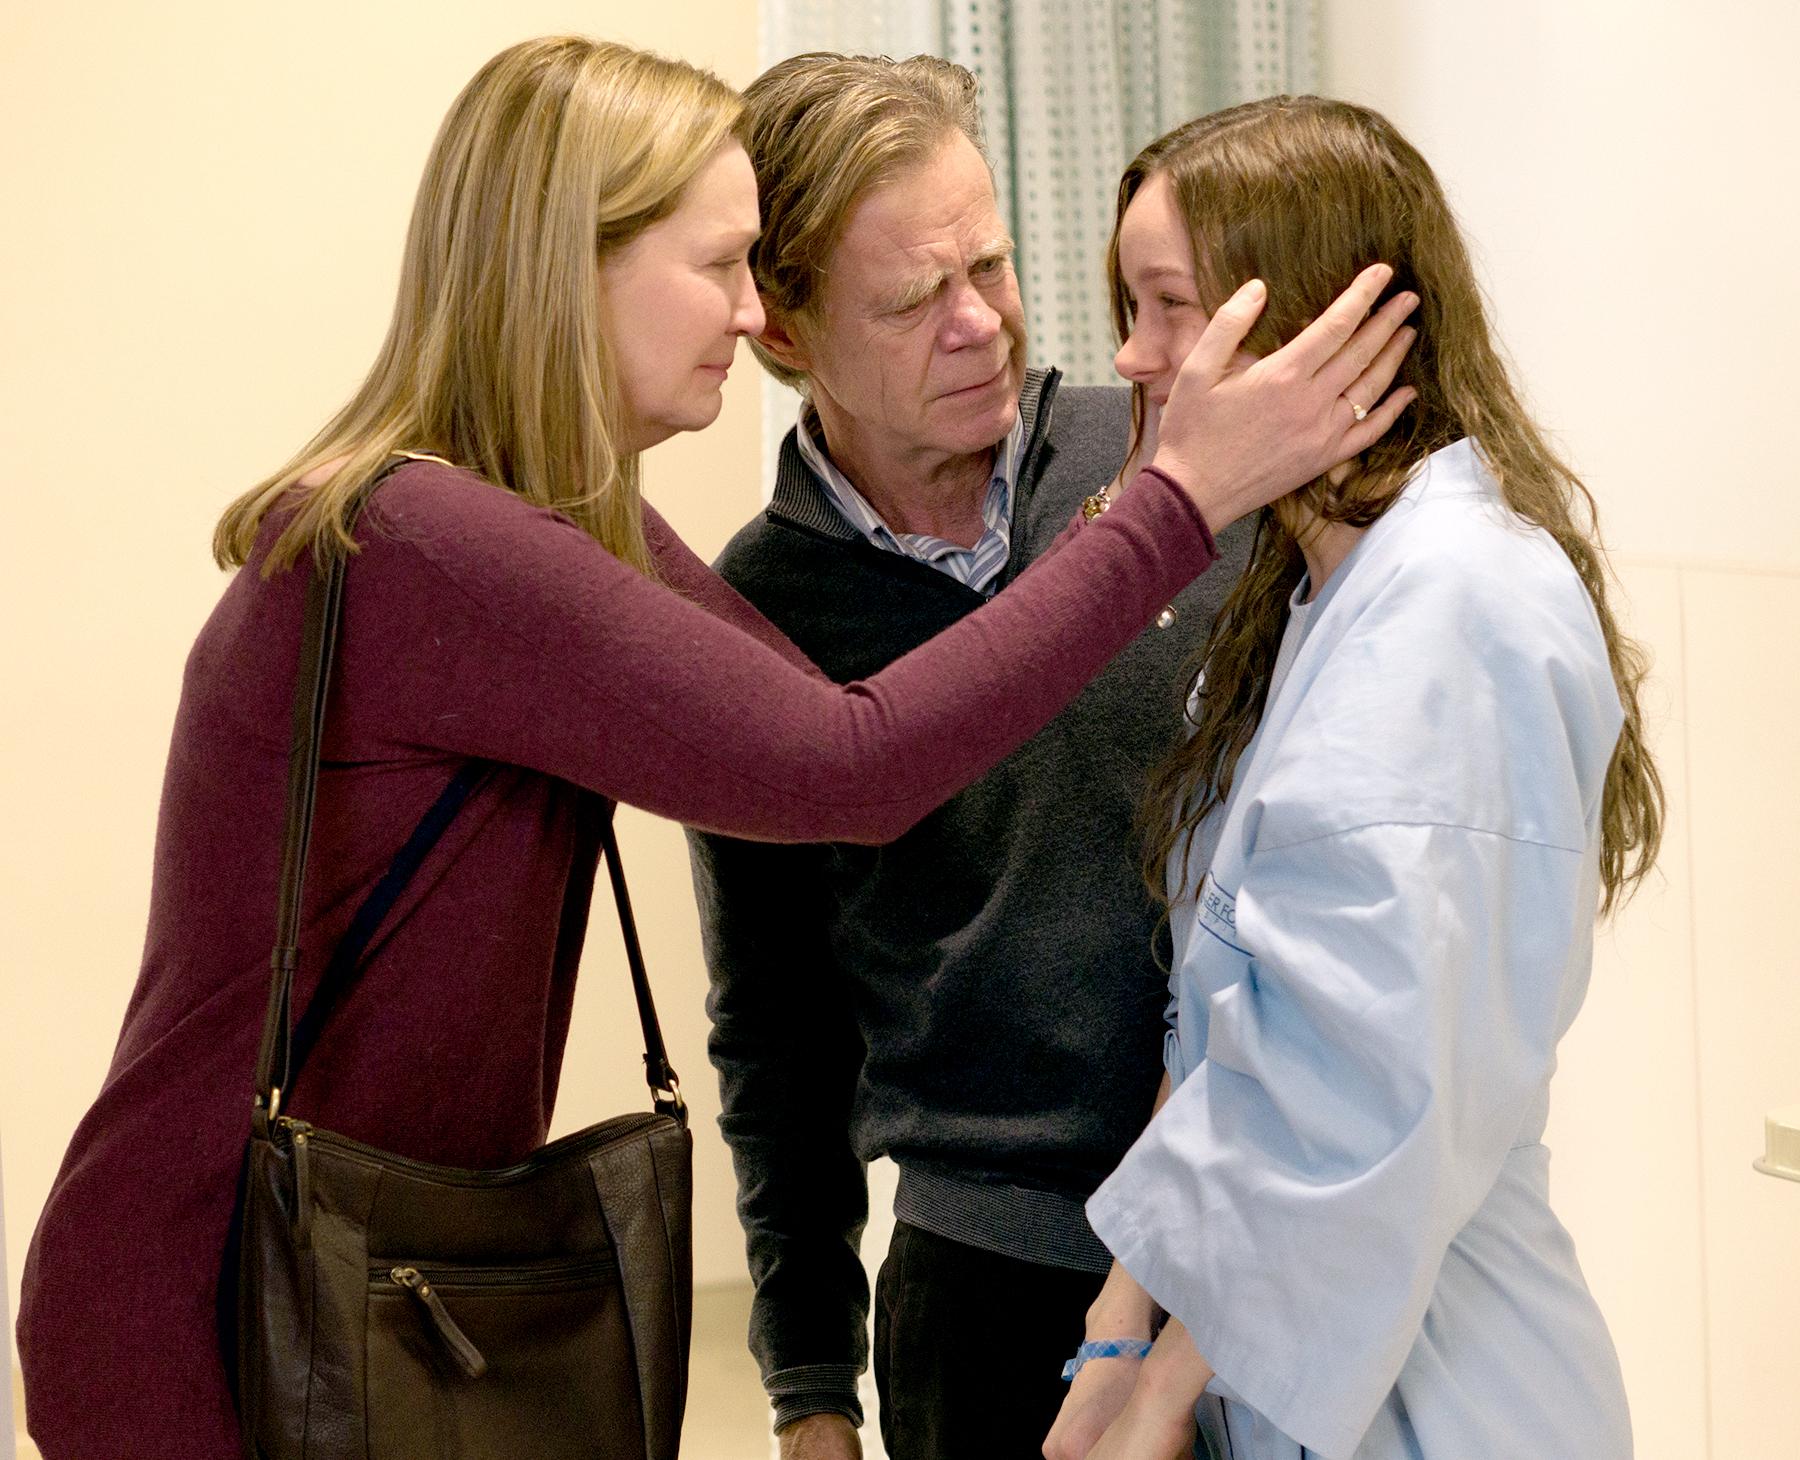 Joan Allen, William H. Macy and Brie Larson in Room.